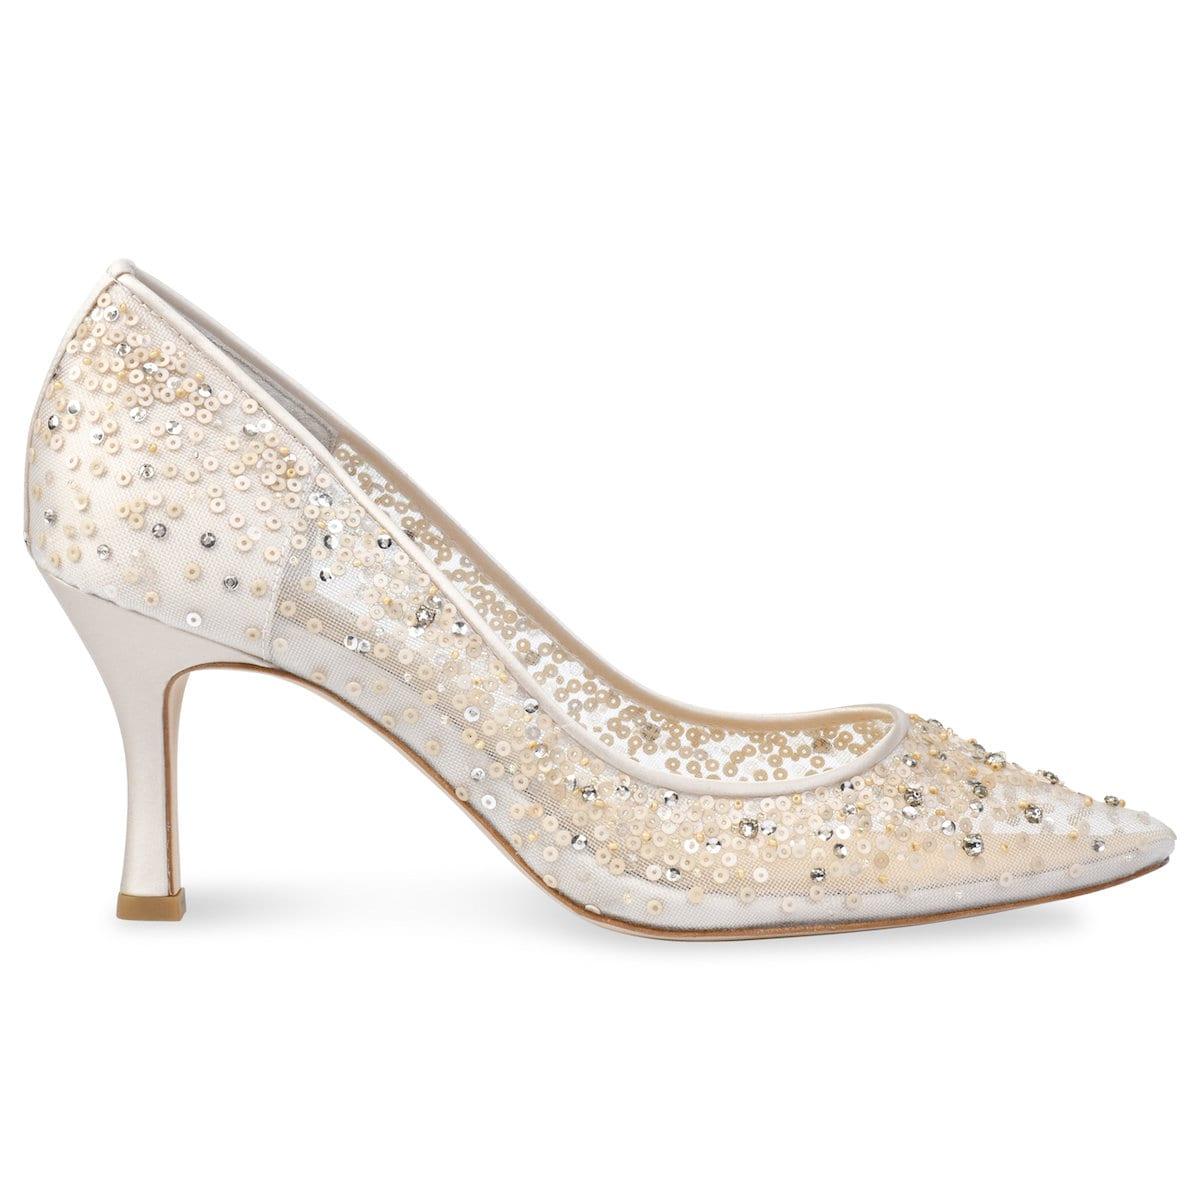 01828504e8b Nude Sequin Low Heel Wedding Shoes | Bella Belle Evelyn Nude